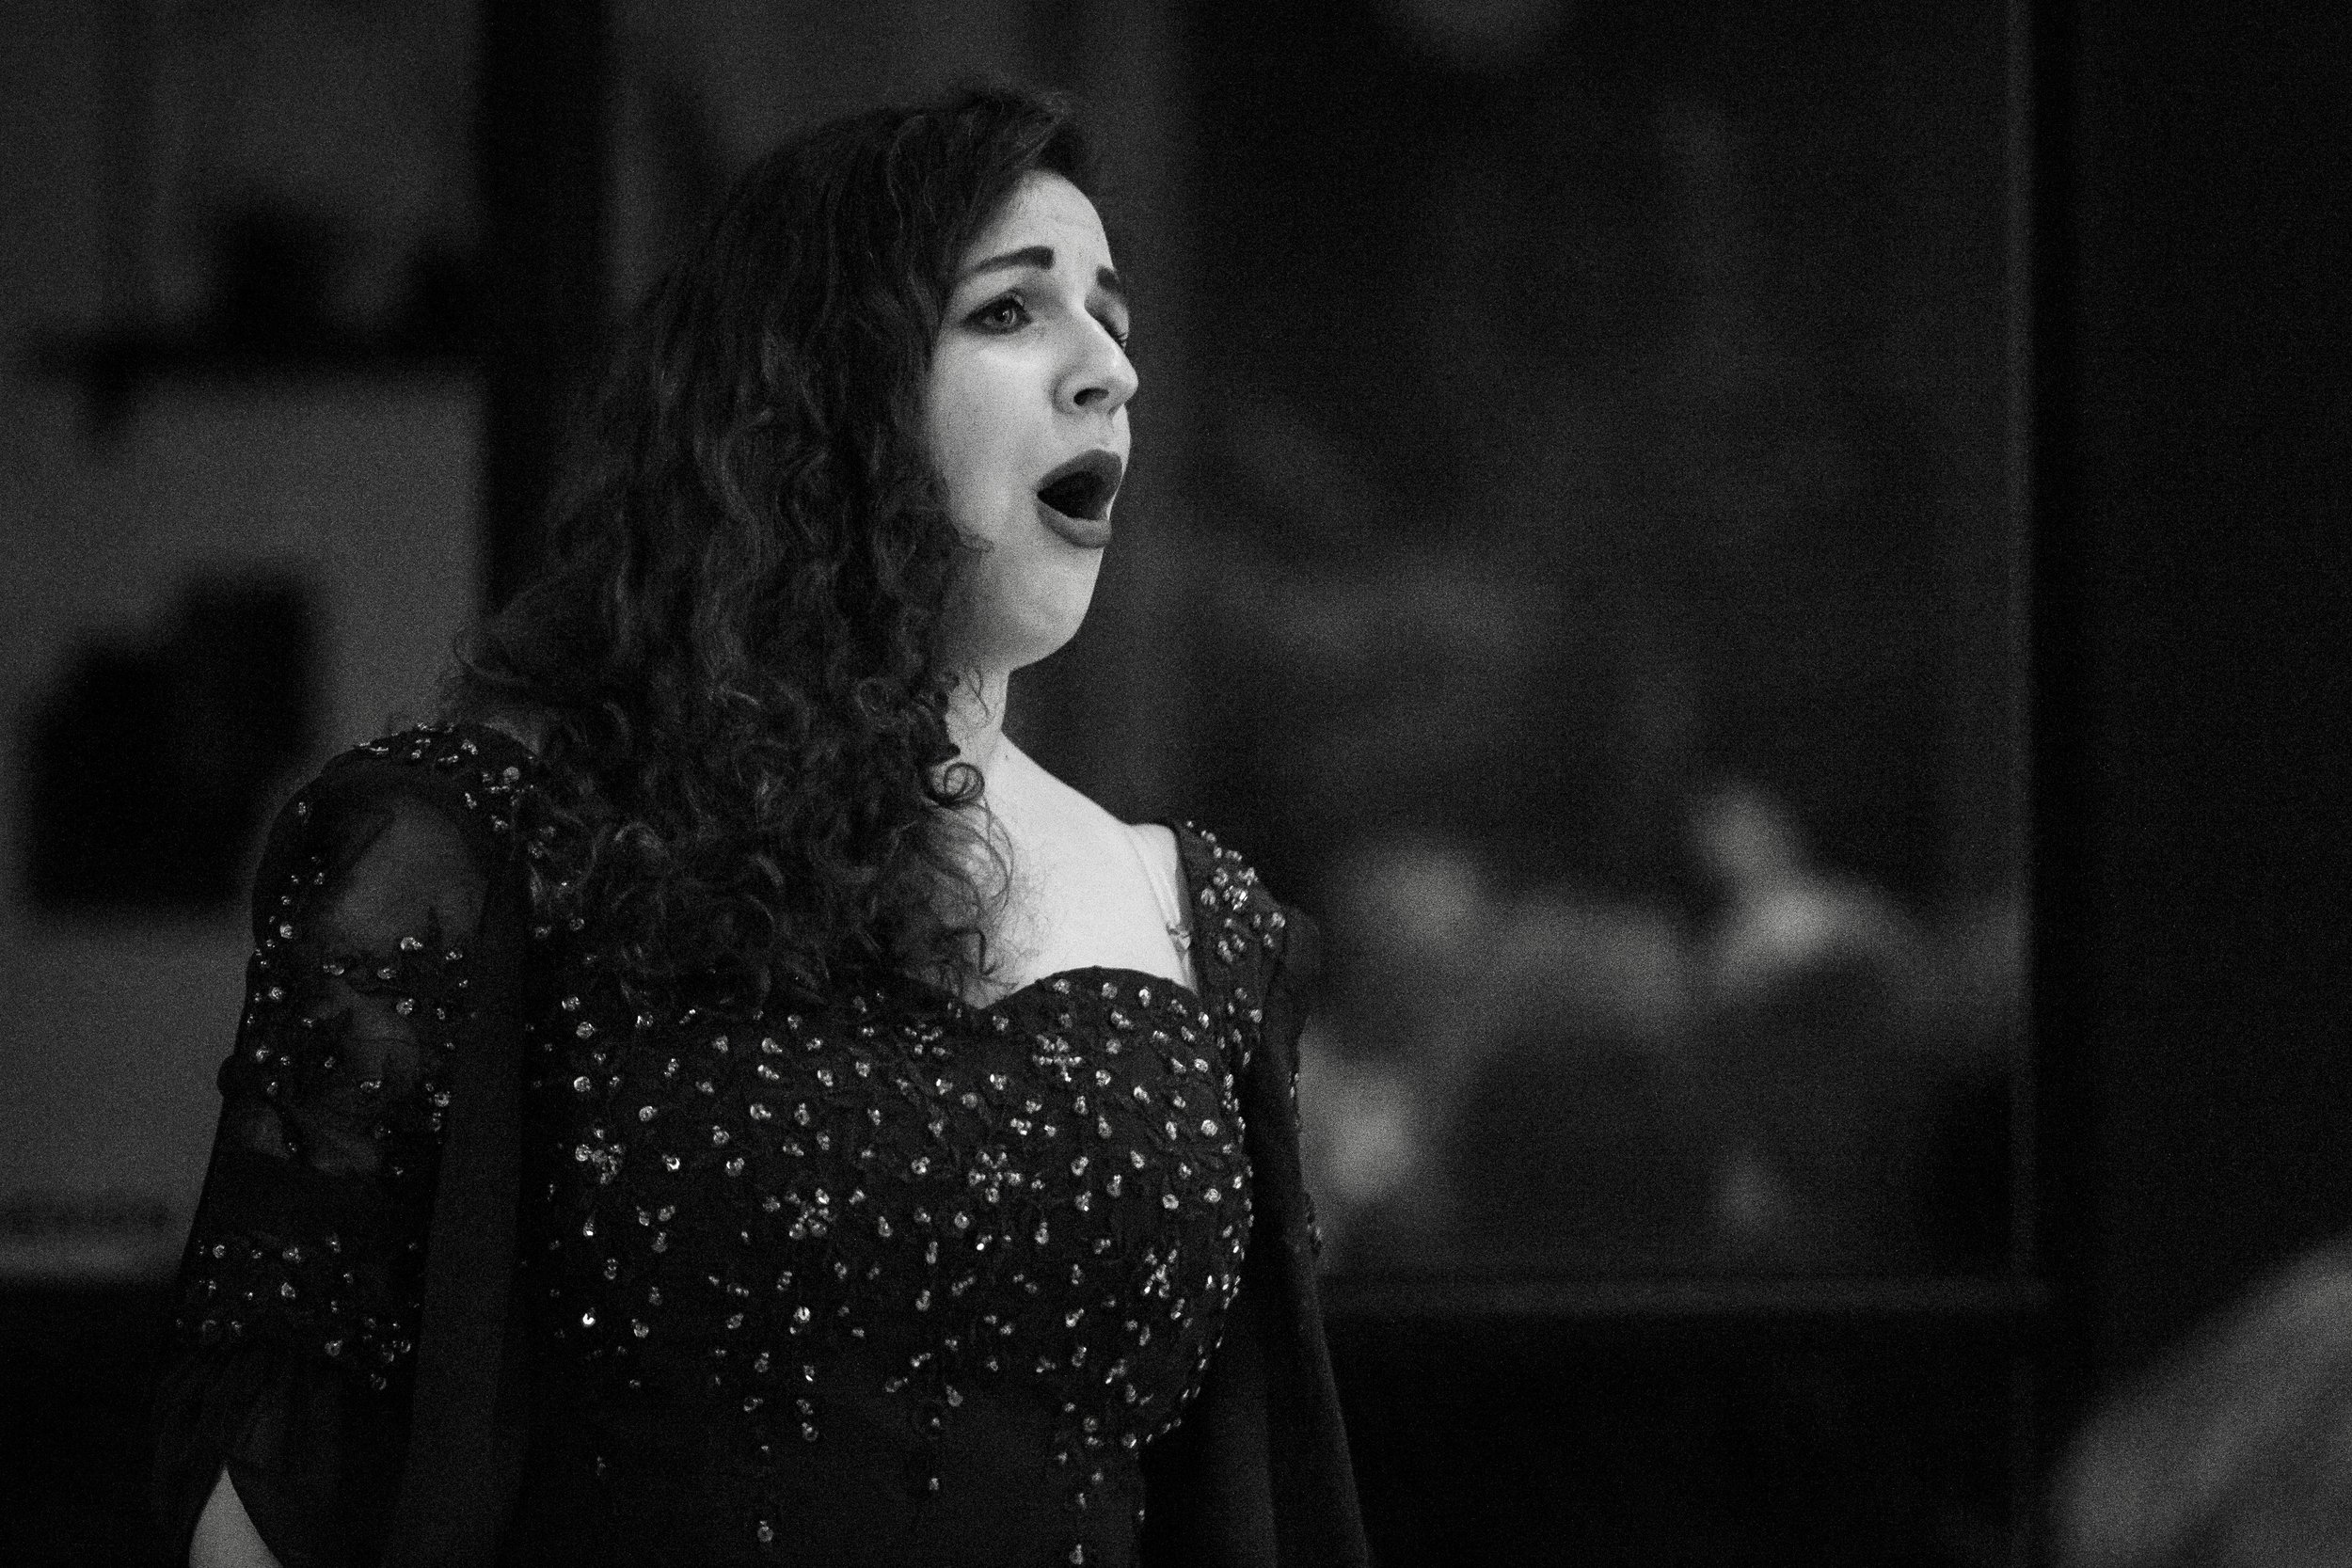 20180223 - bare opera - love is love 0009.jpeg